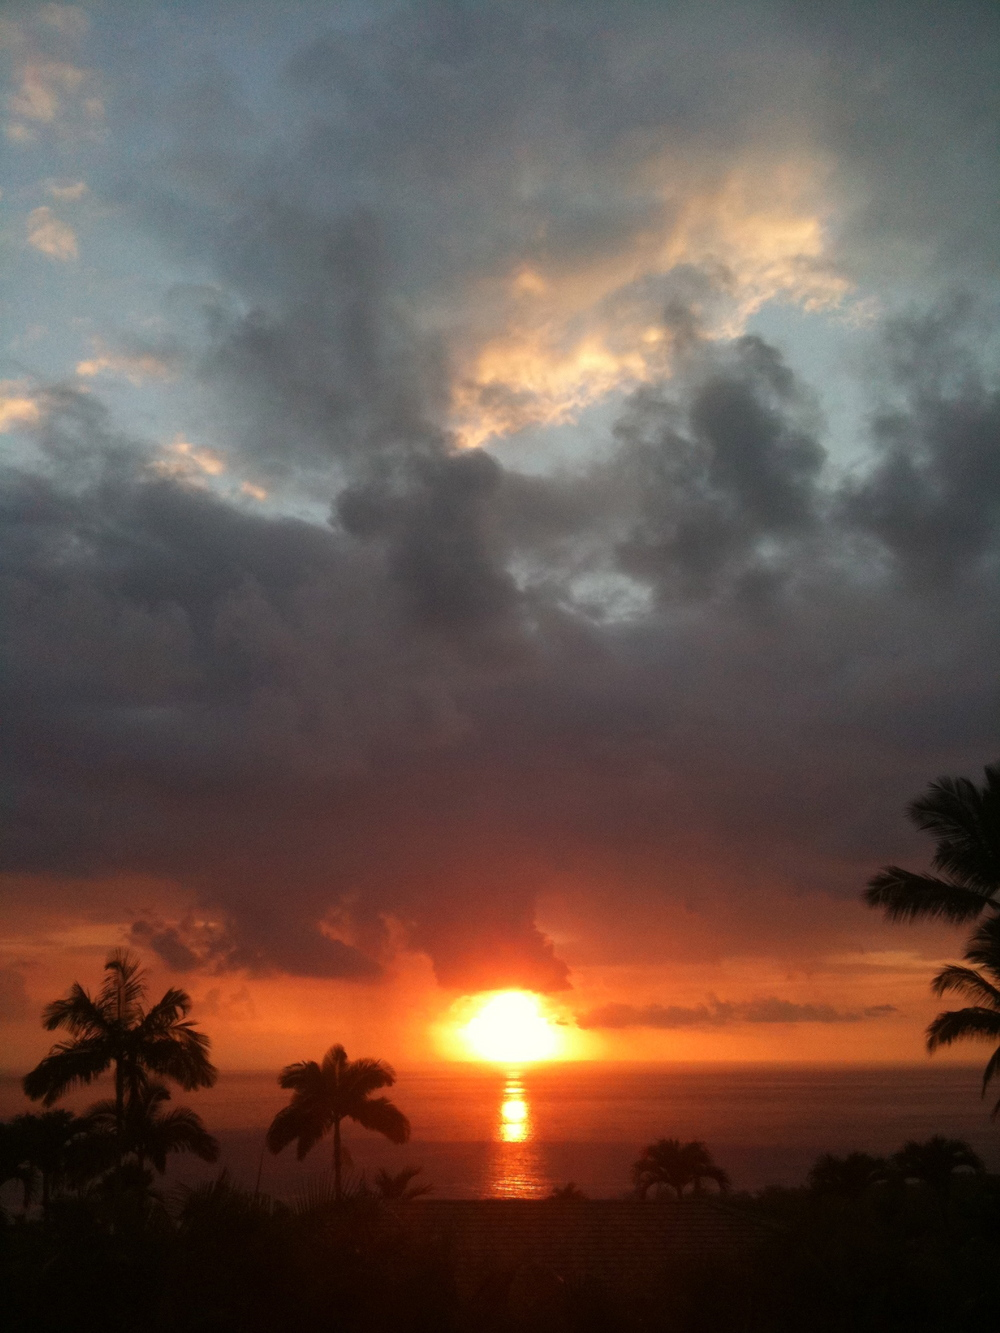 Sunset August 30, 2011. Keauhou, Kona, HI